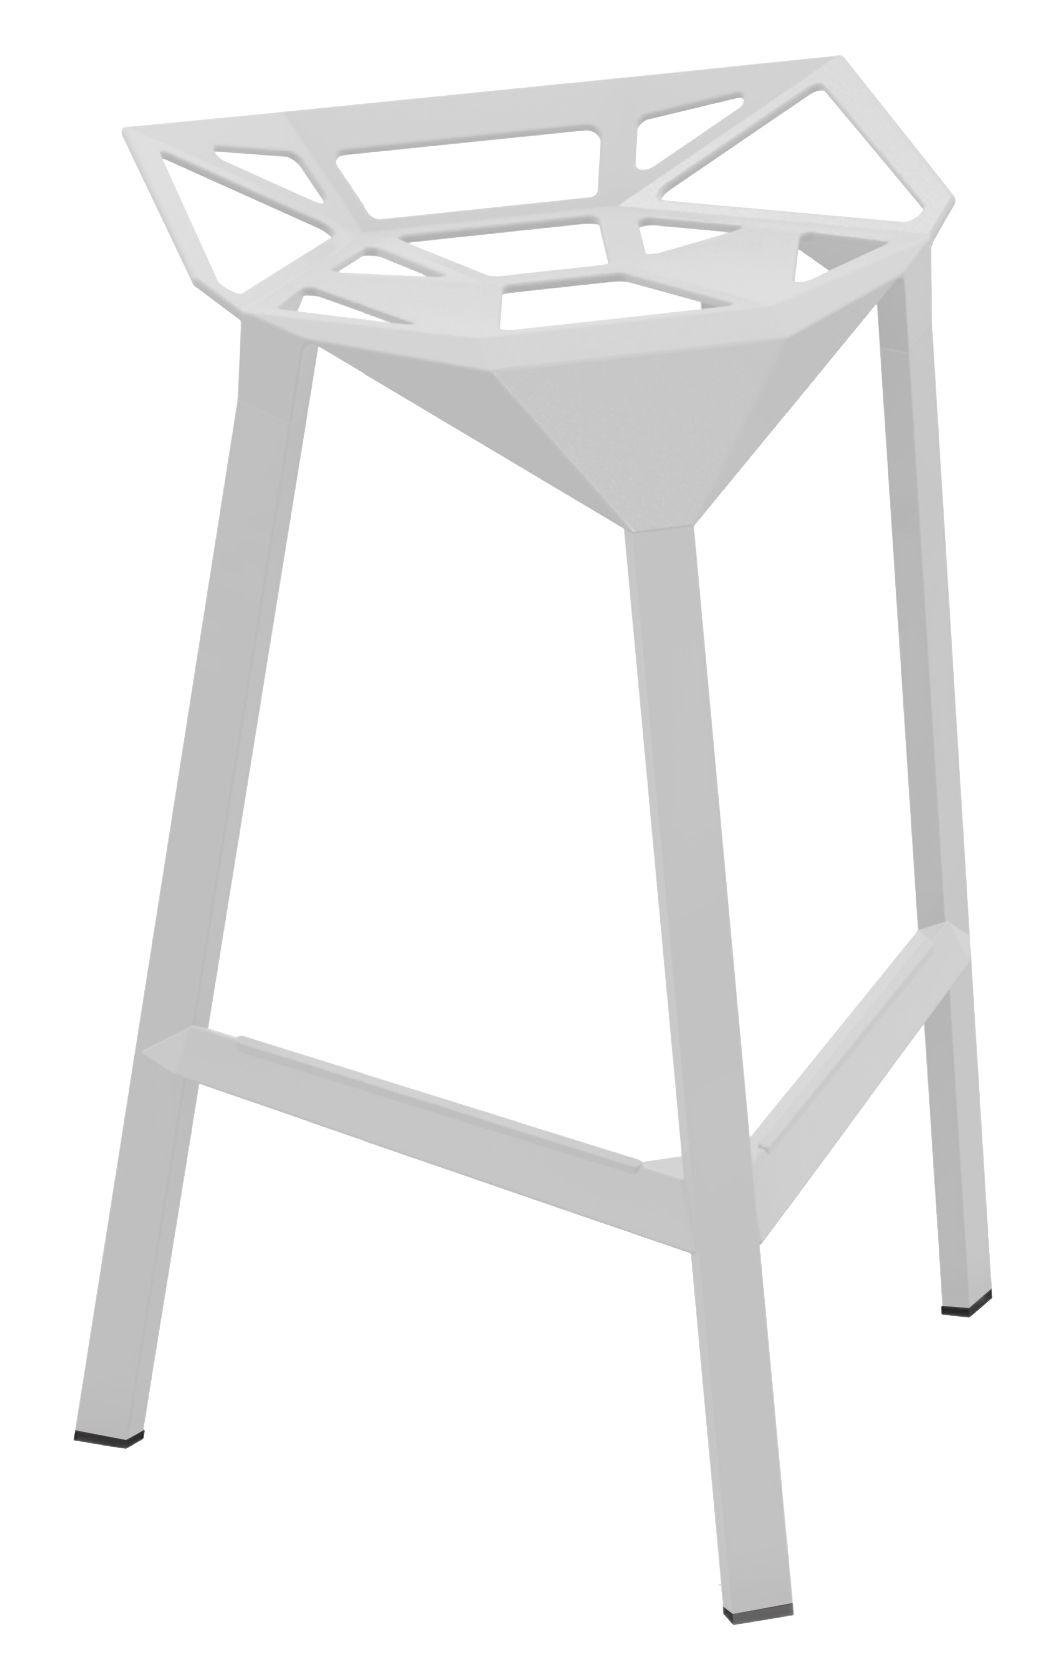 Mobilier - Tabourets de bar - Tabouret de bar Stool One / H 67 cm - Métal - Magis - Blanc - Aluminium